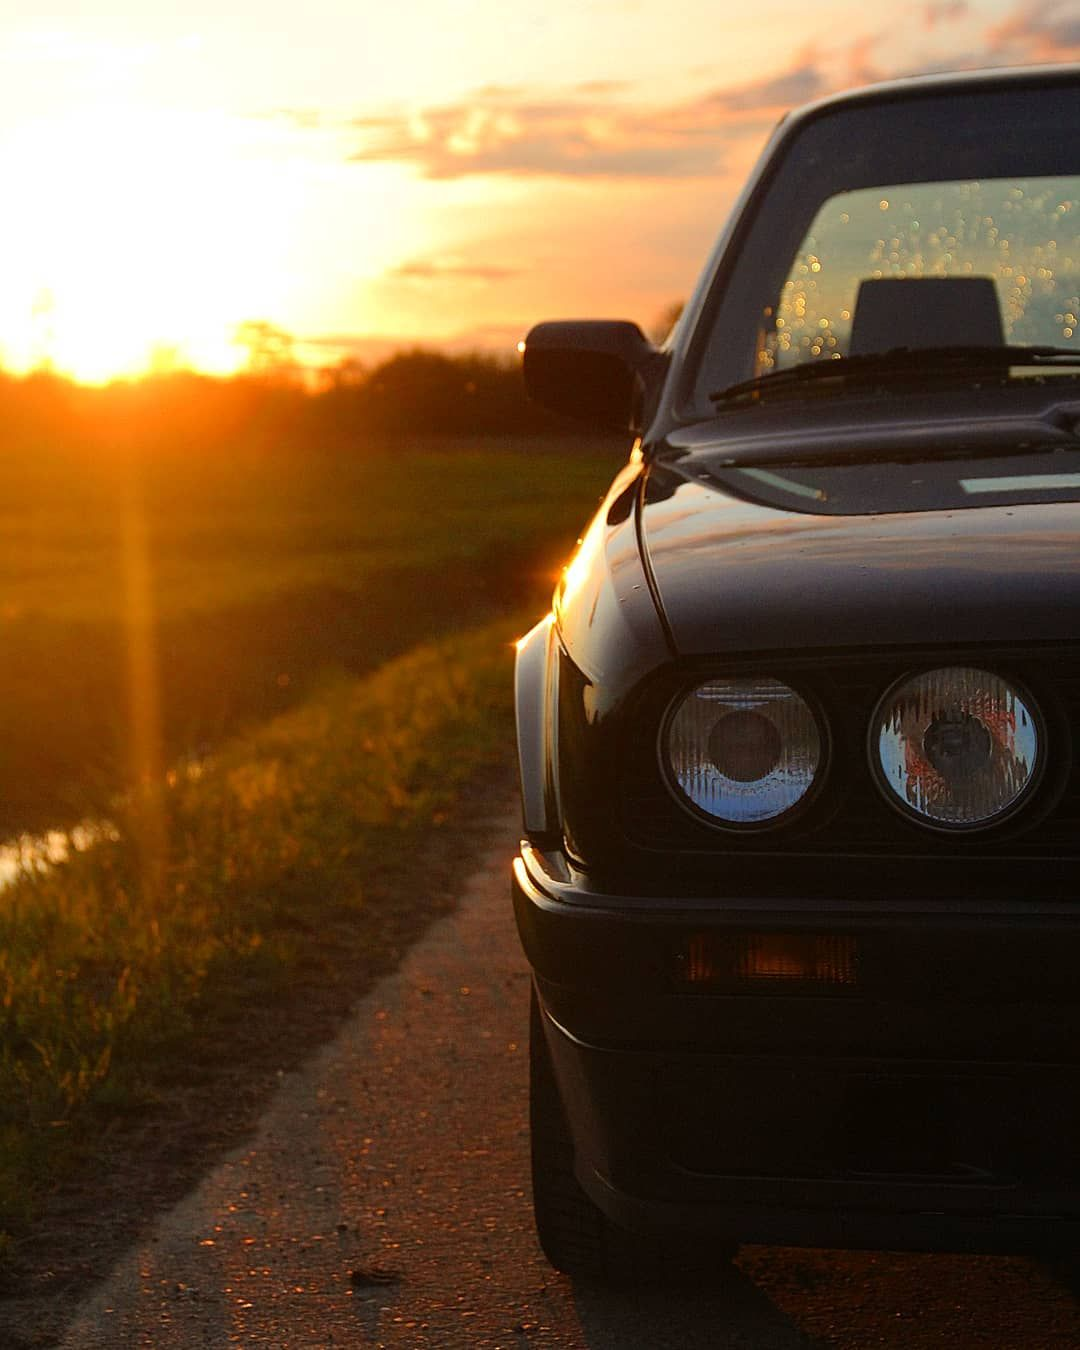 Bmw Z8 Sports Car: #bmw#e30#sunset#carlove#carporn#bmwe30#bbs#oldtimer